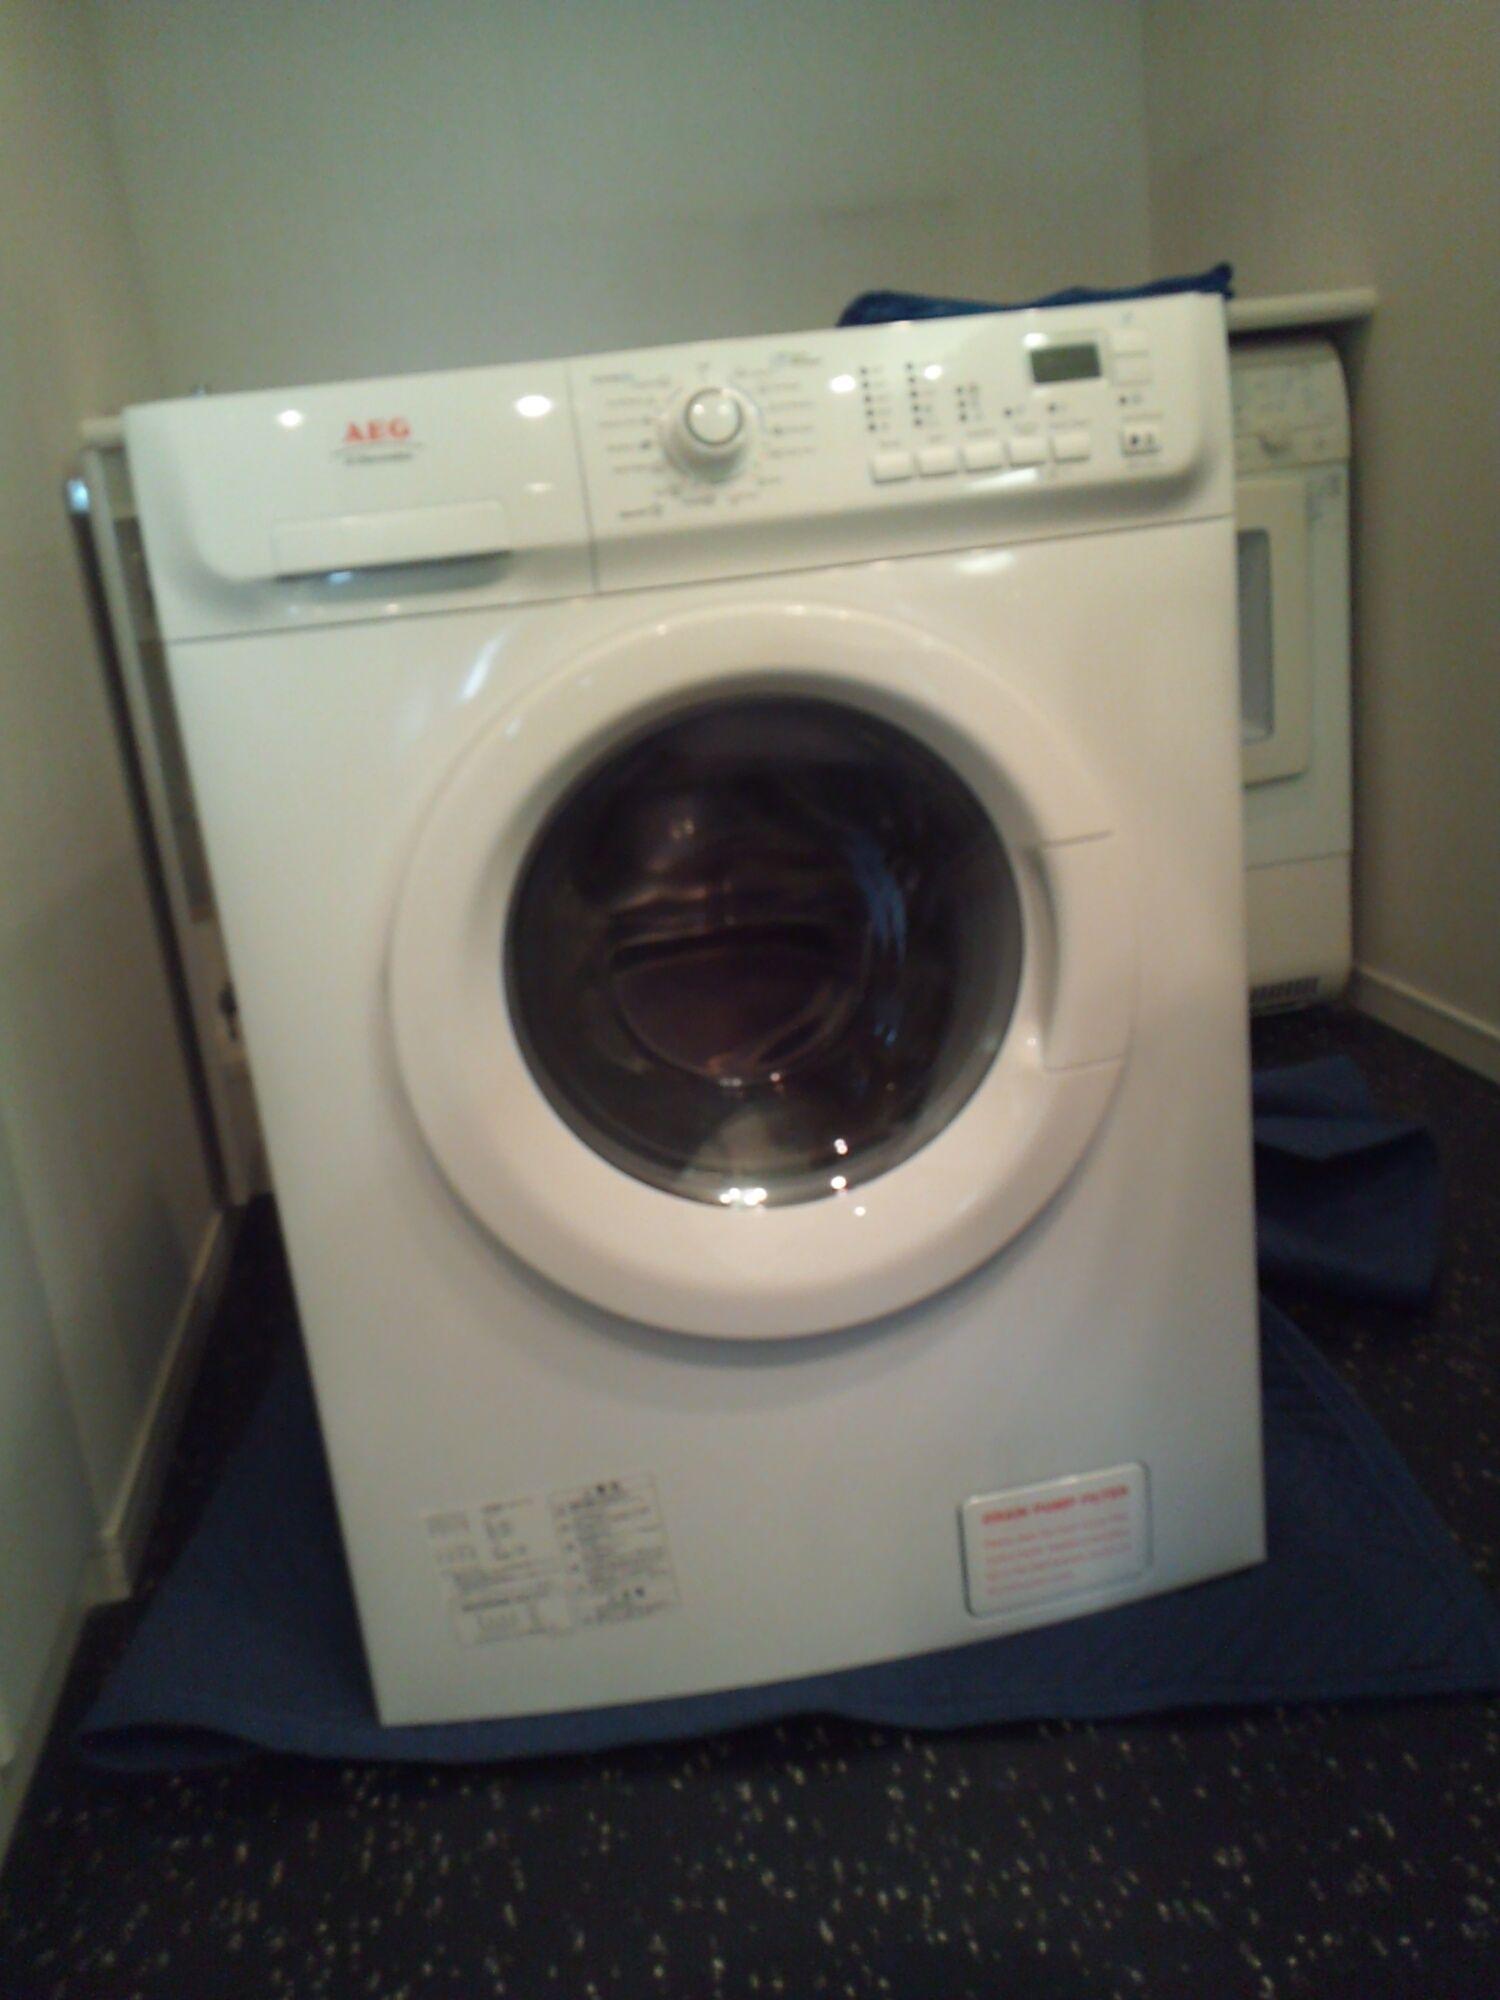 AEG 全自動洗濯乾燥機 EWW1273 ¥31,5000- http://www.kenthouse.co.jp/aeg/item/EWW1291.html